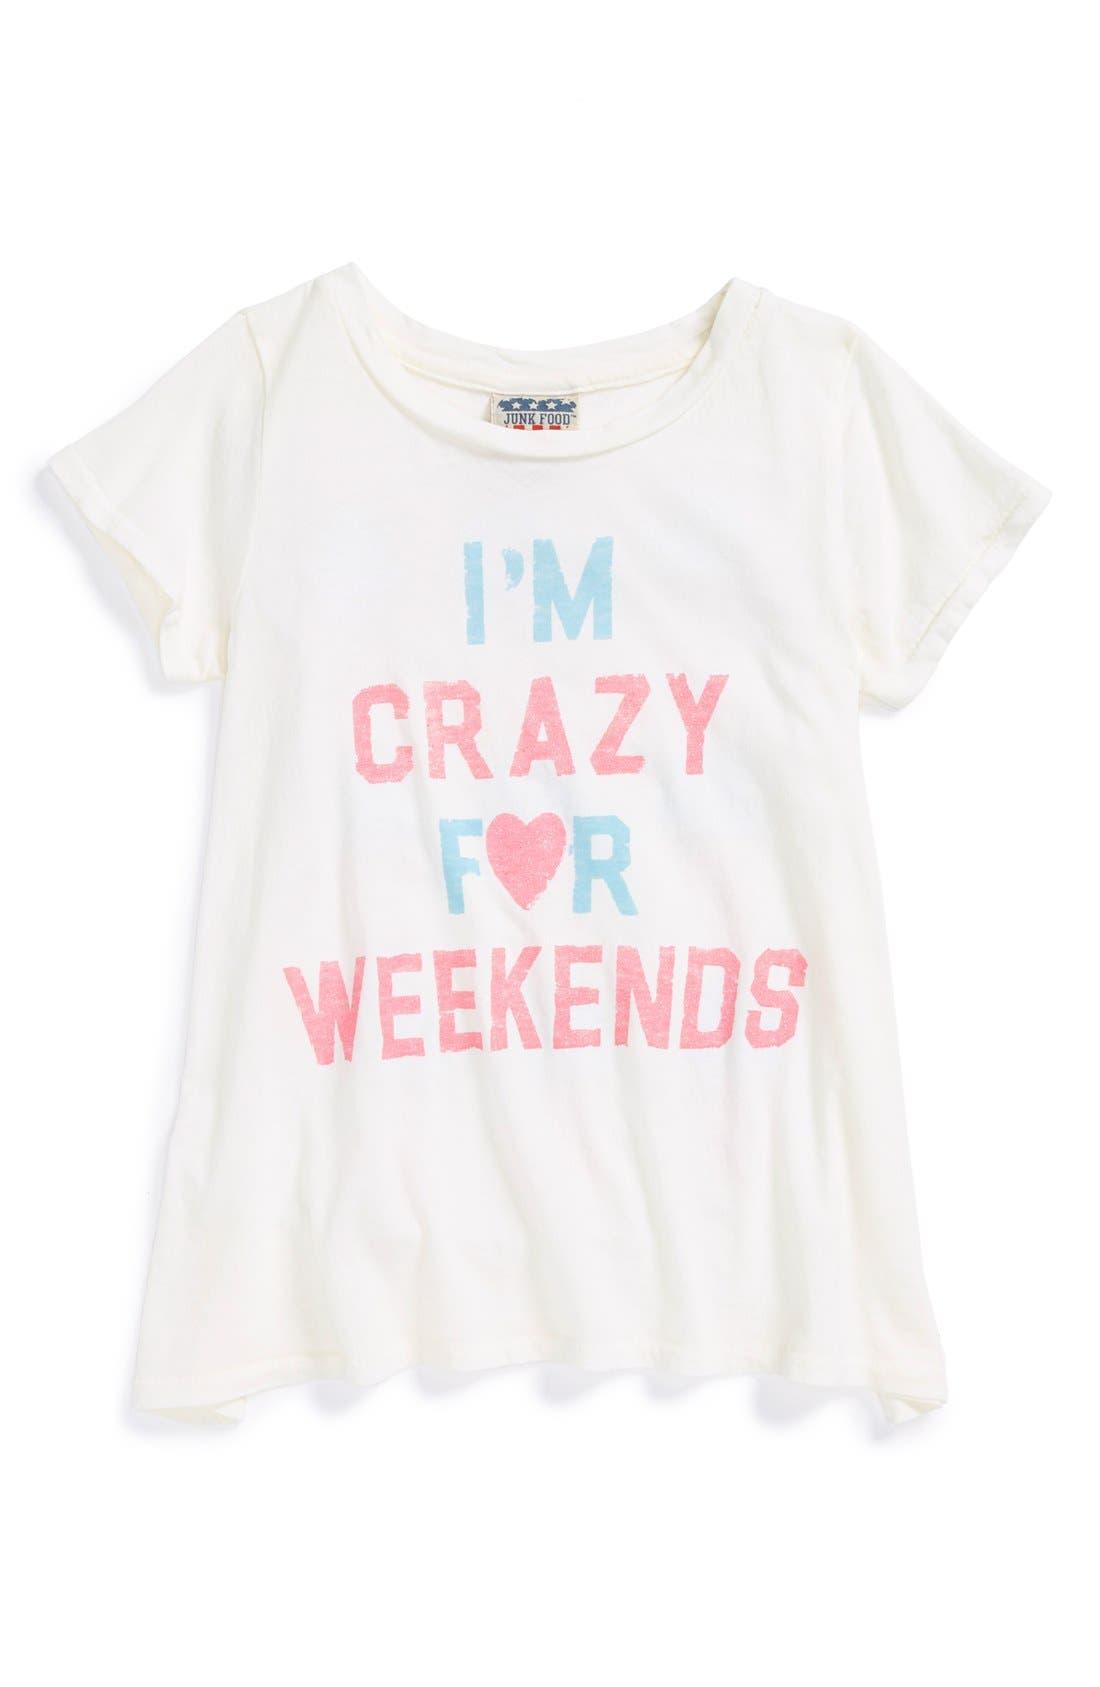 Alternate Image 1 Selected - Junk Food 'I'm Crazy for Weekends' Tee (Big Girls)